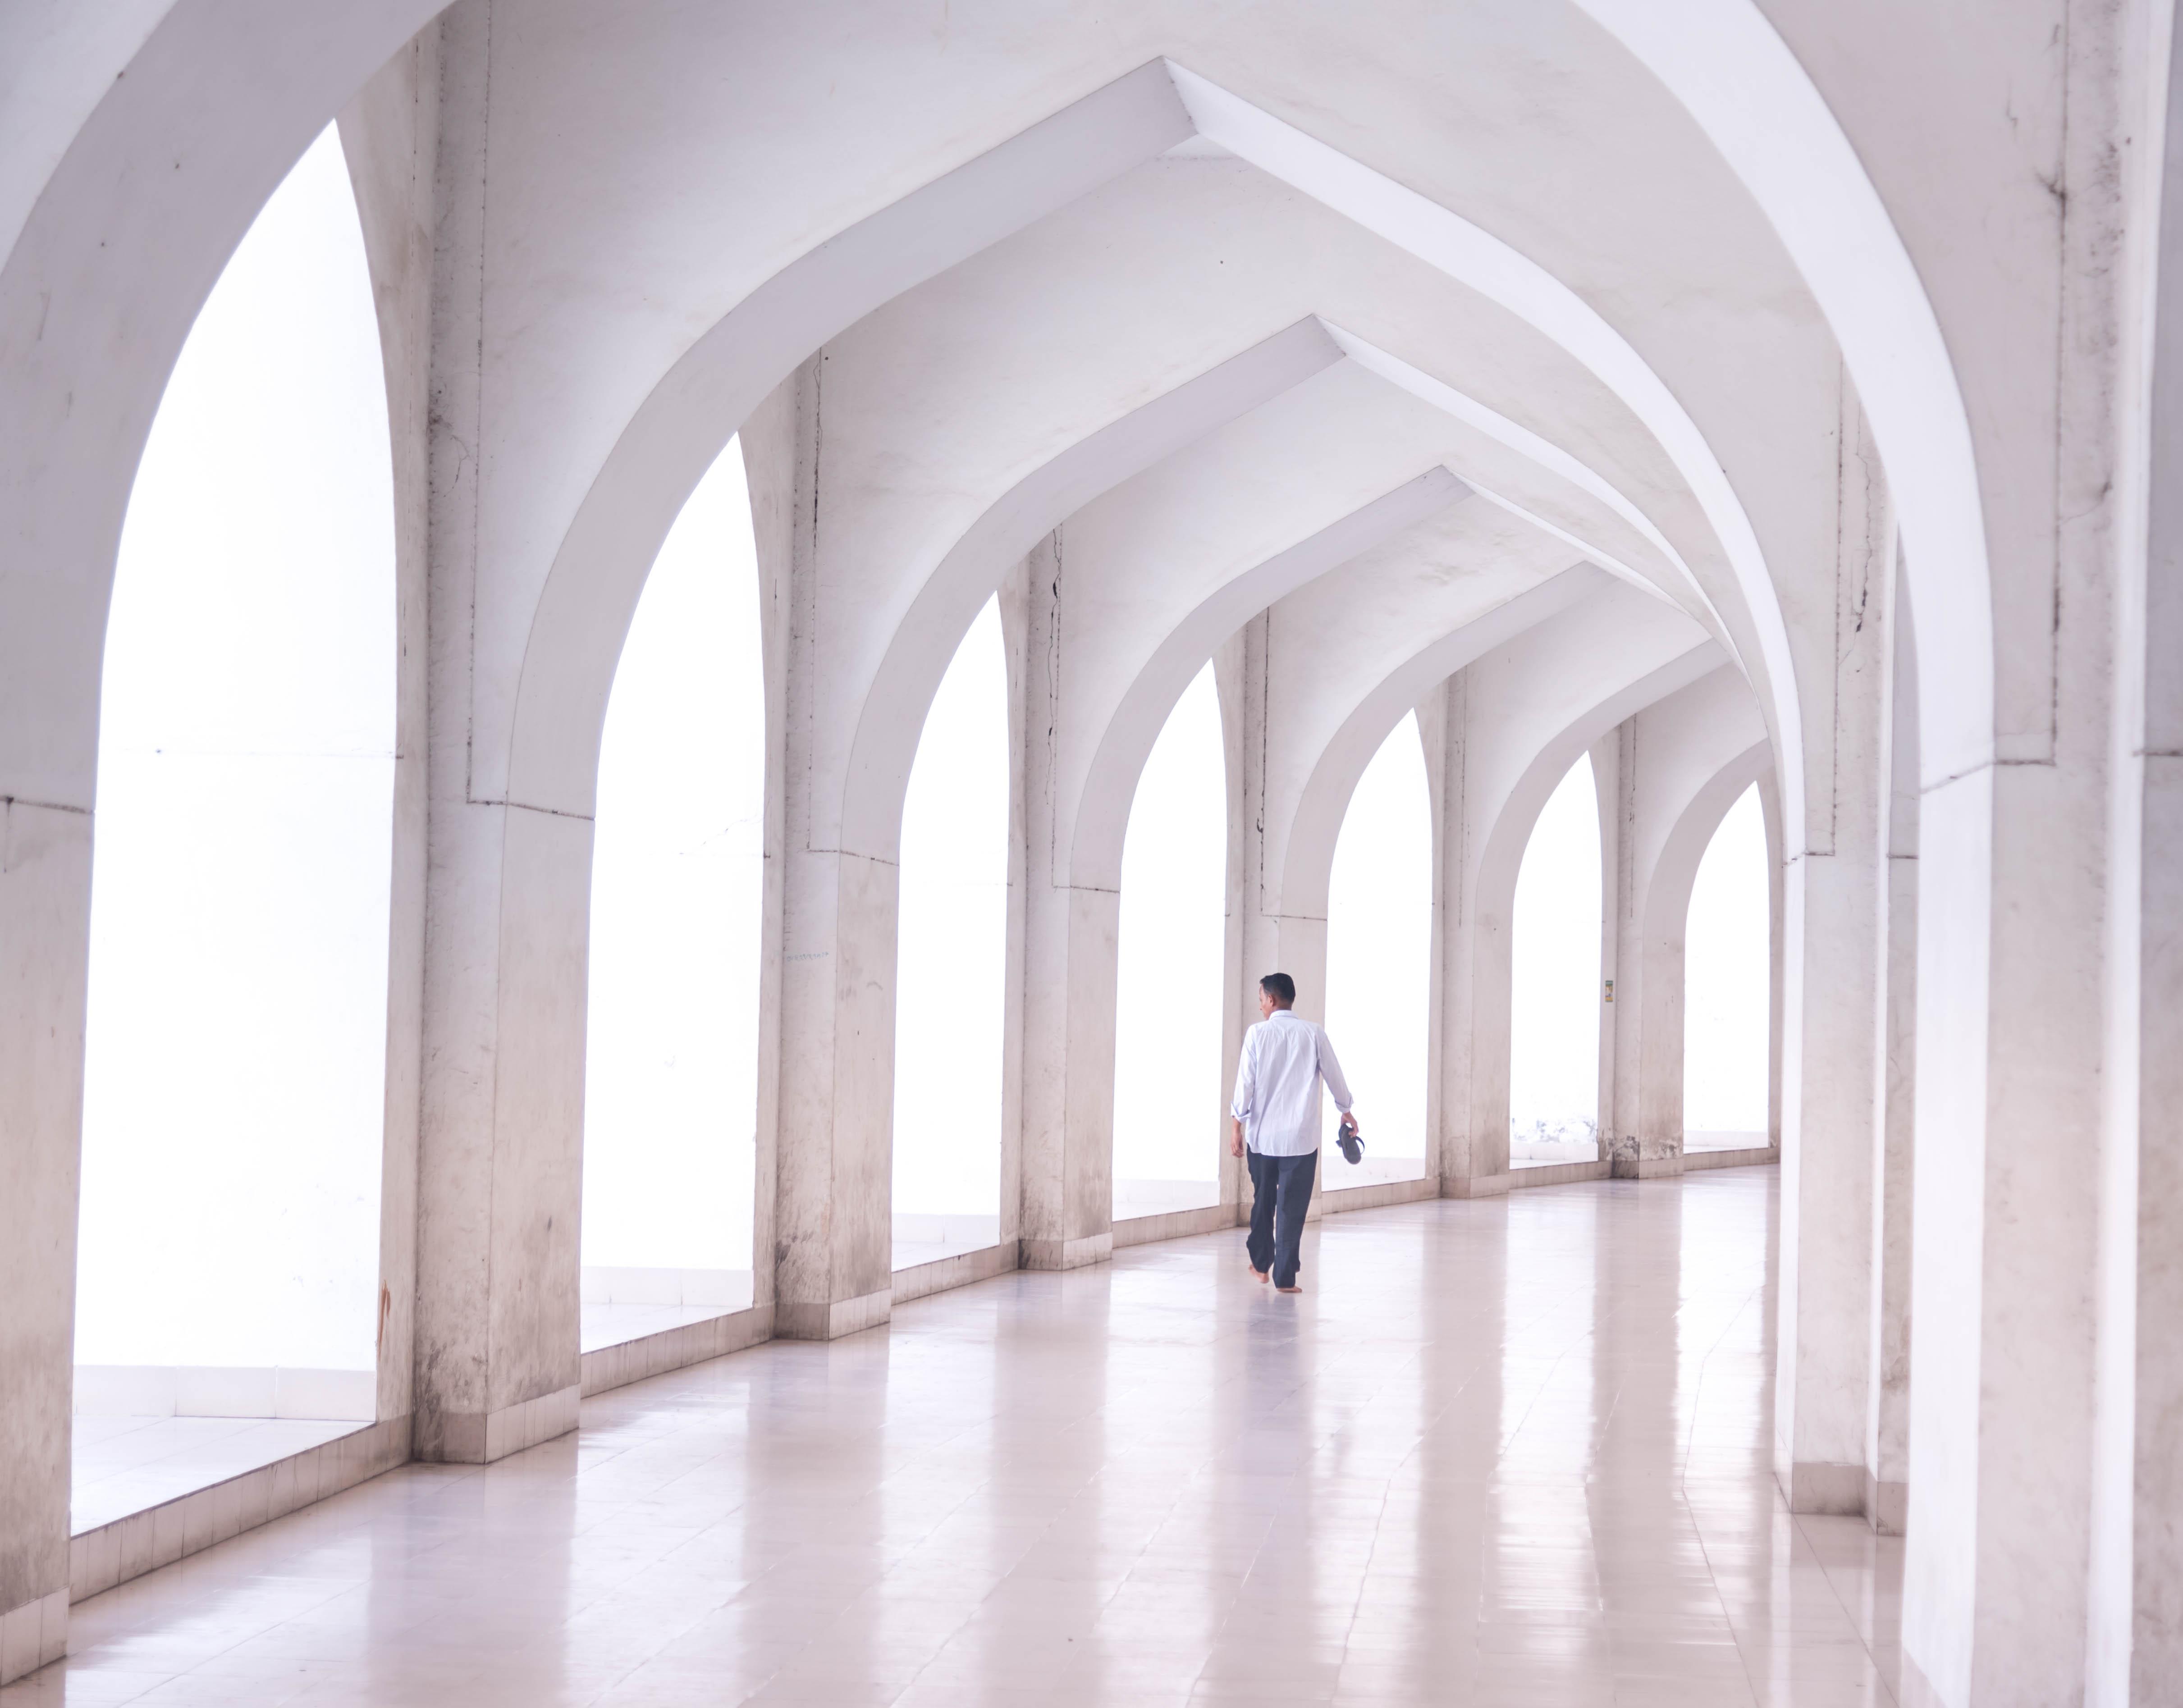 Friday Muslim Prayer Amid Covid-19 Pandemic